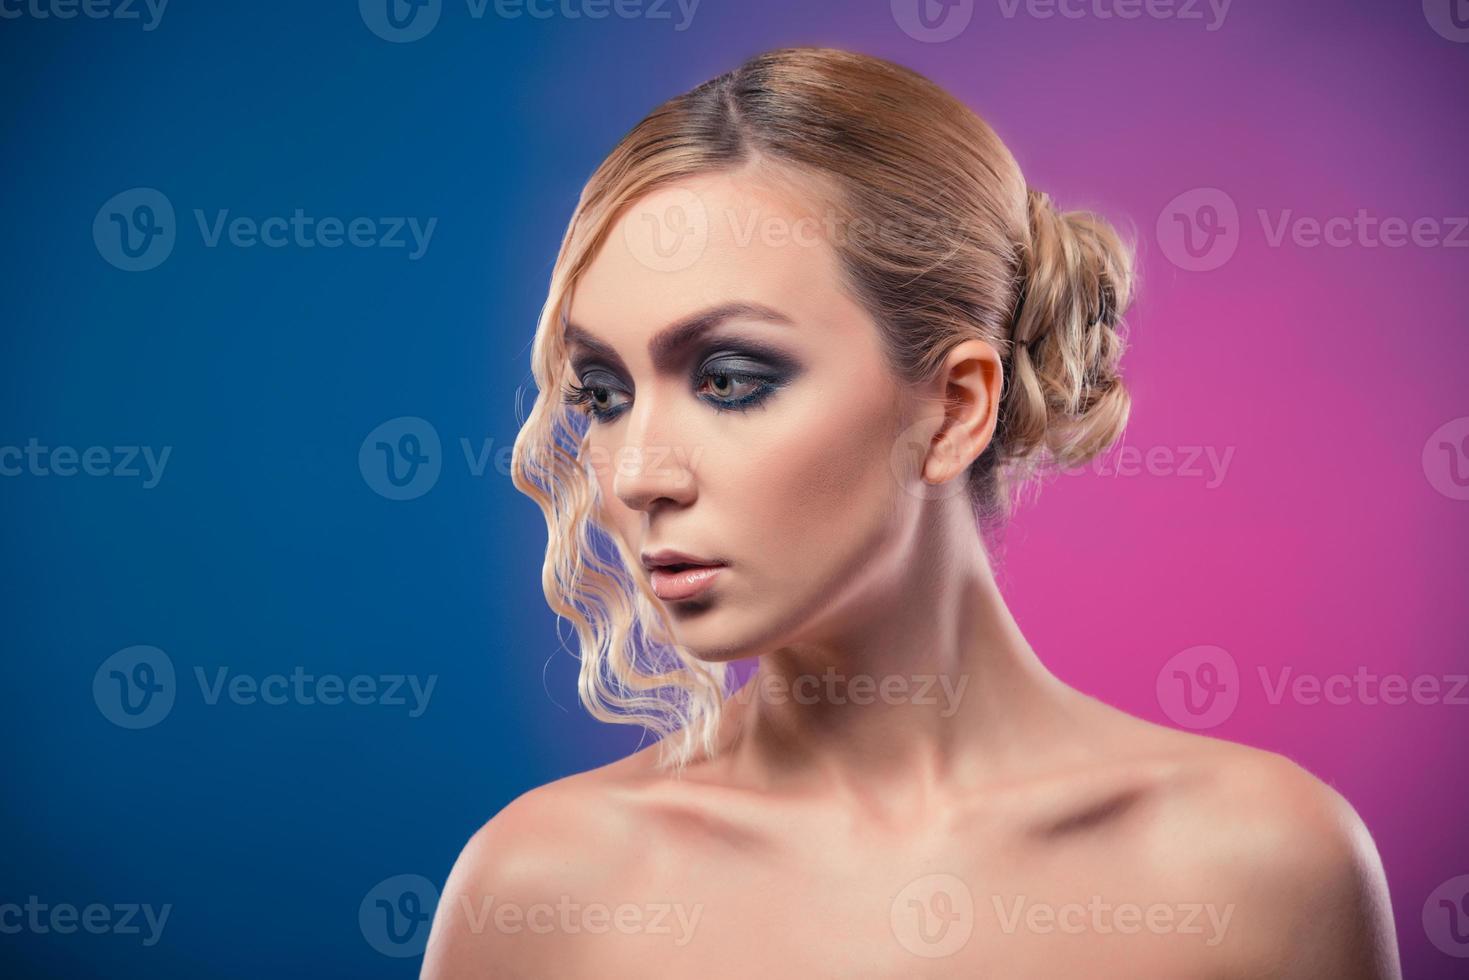 hermosa mujer lujosa sobre fondo morado foto